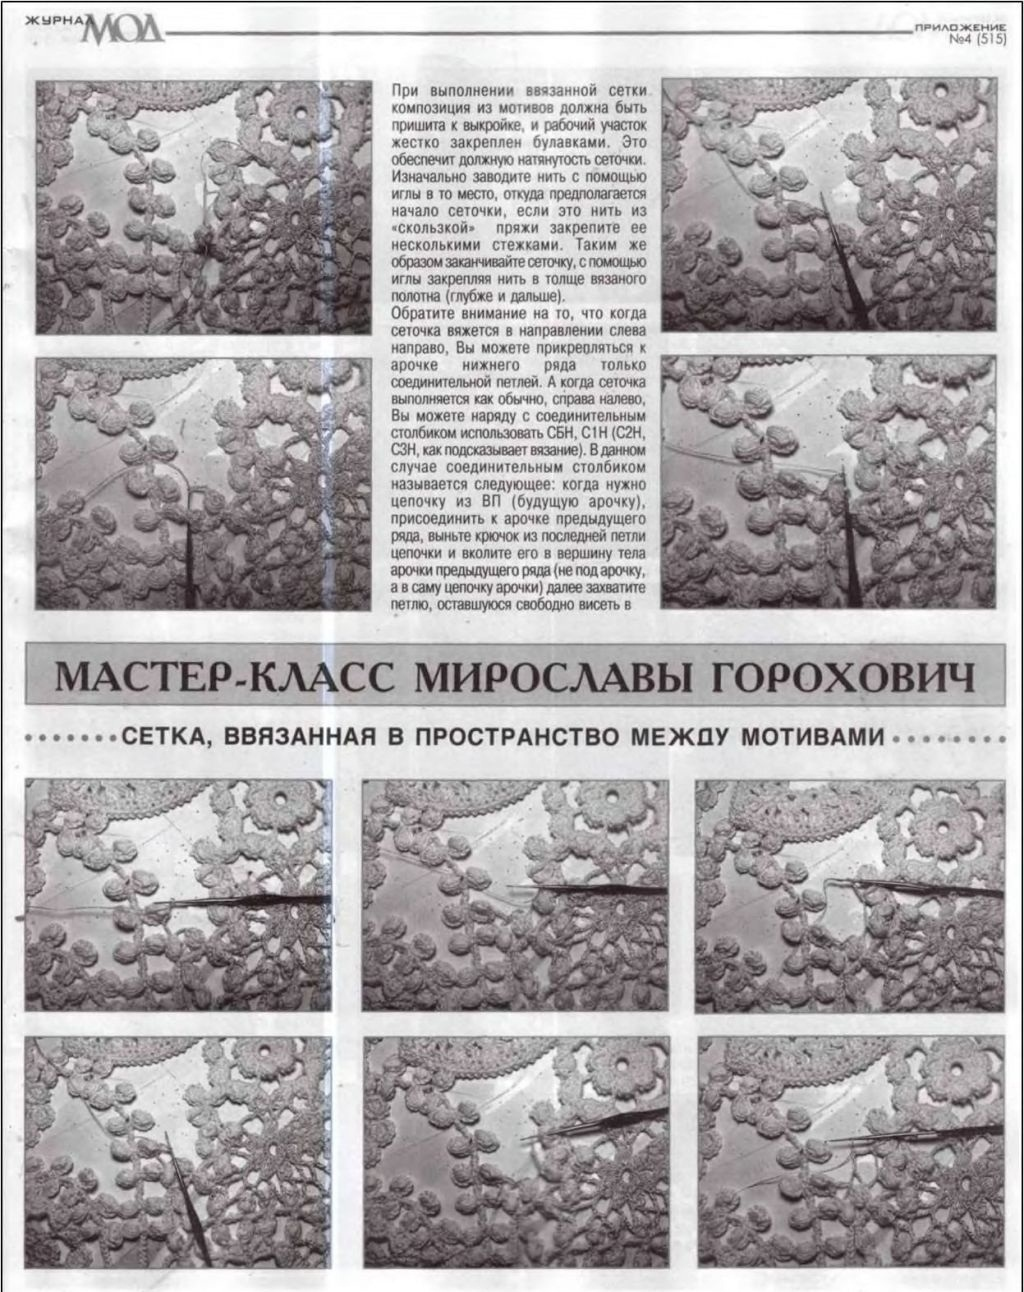 Mастер Мирослава Горохович. Bязание в технике ирландского 42